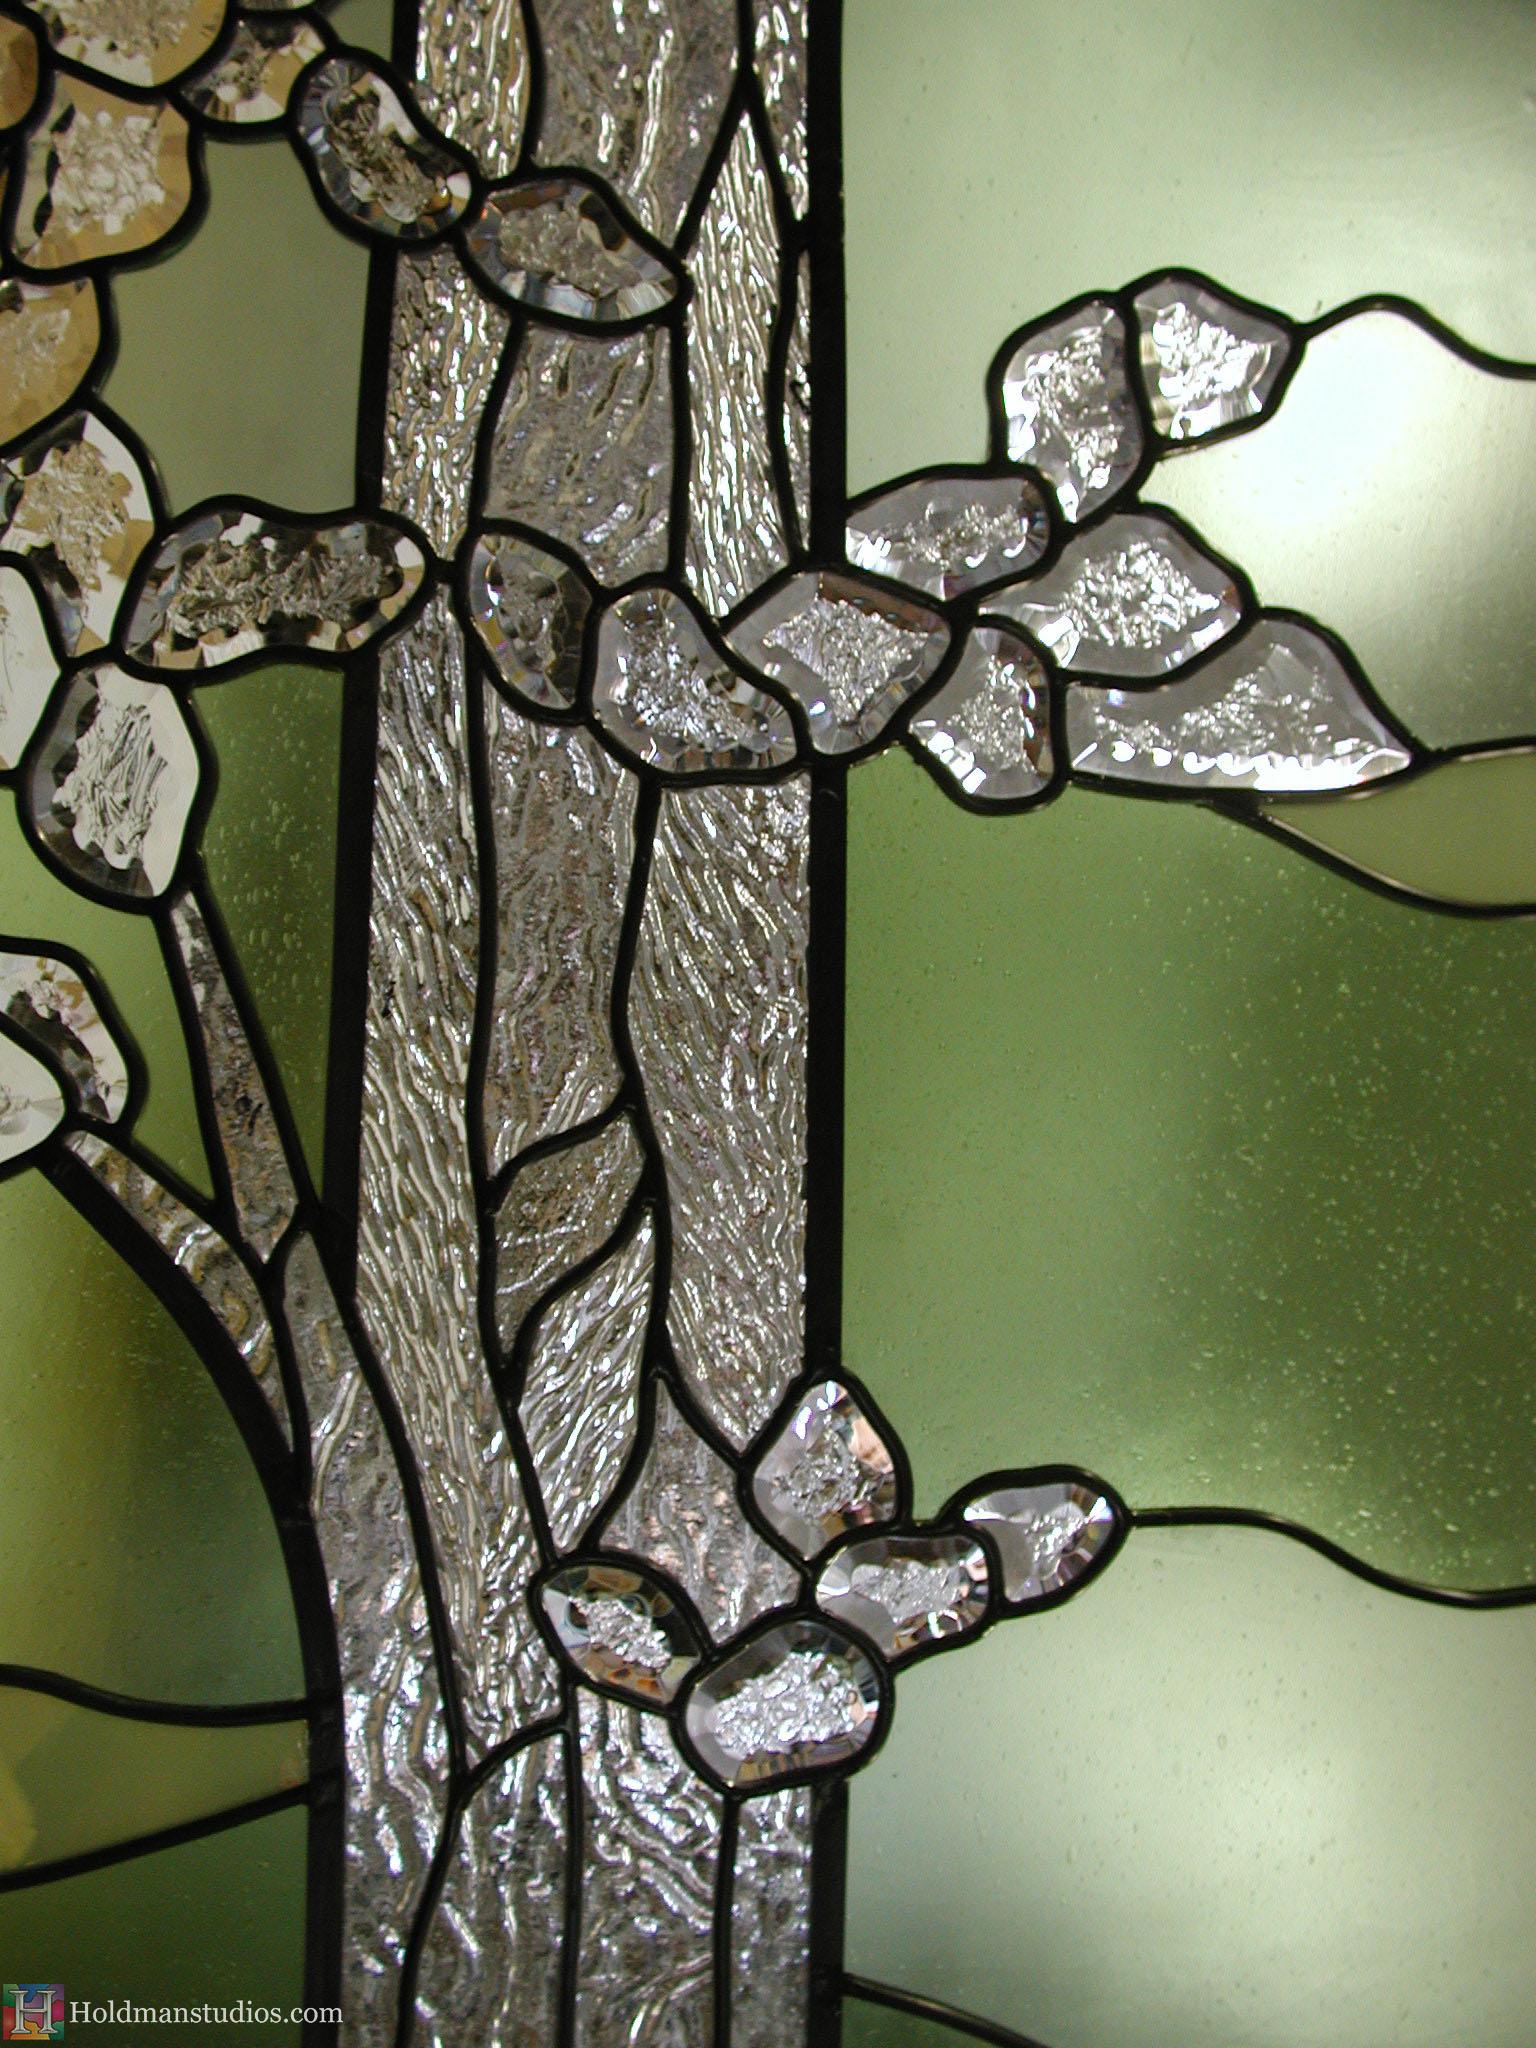 Holdman_Studios_Stained_Art_Glass_LDS_Mormon_Palmyra_New_York_Temple_Sacred_Grove_Tree_of_Life_Window_Closeup4.jpg